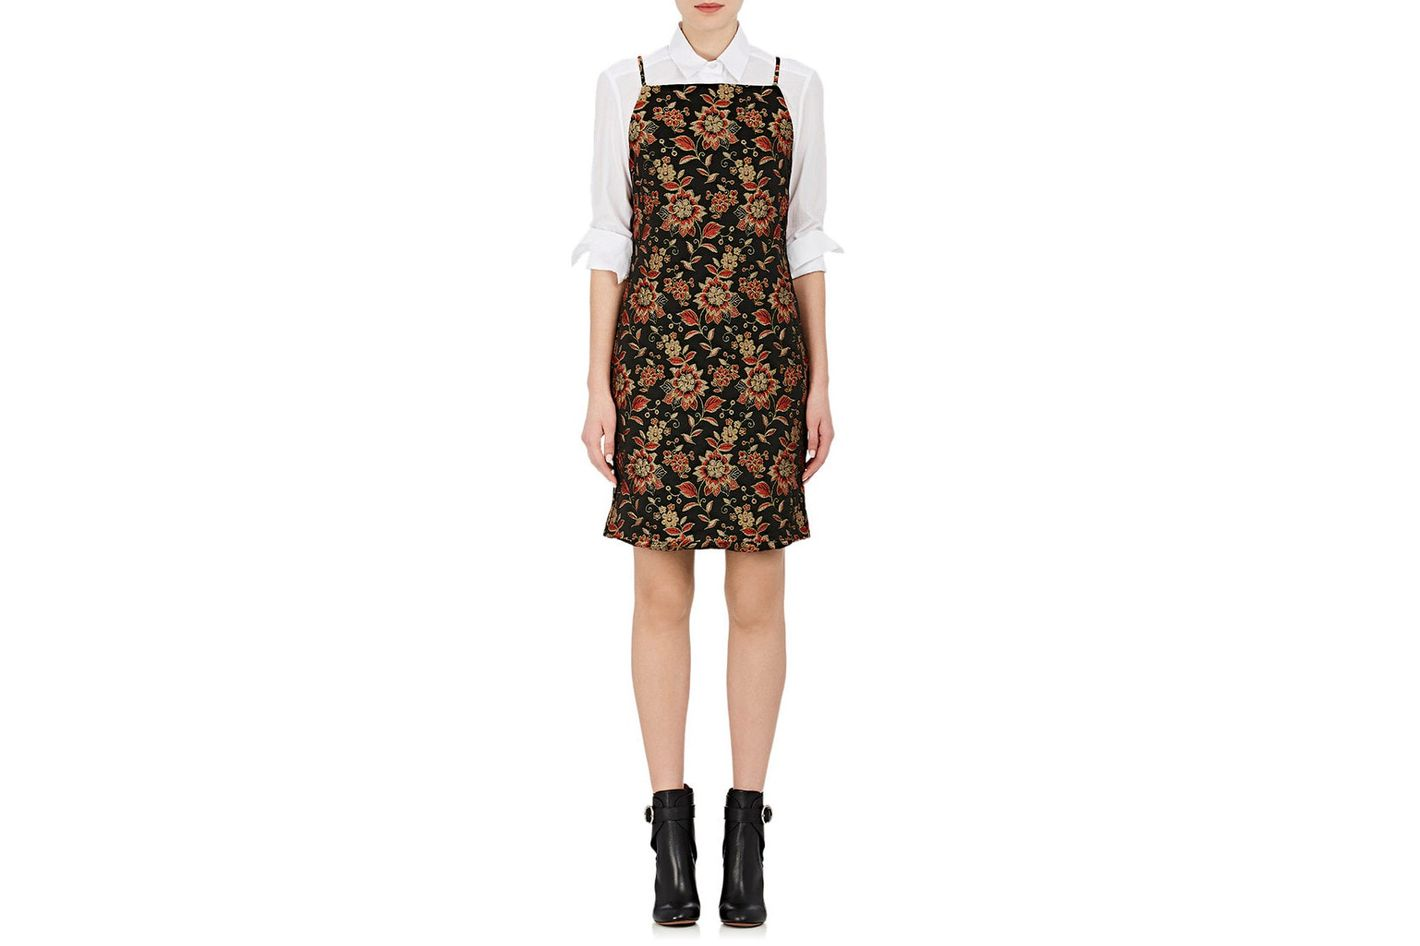 NOMIA Floral Jacquard Shift Dress